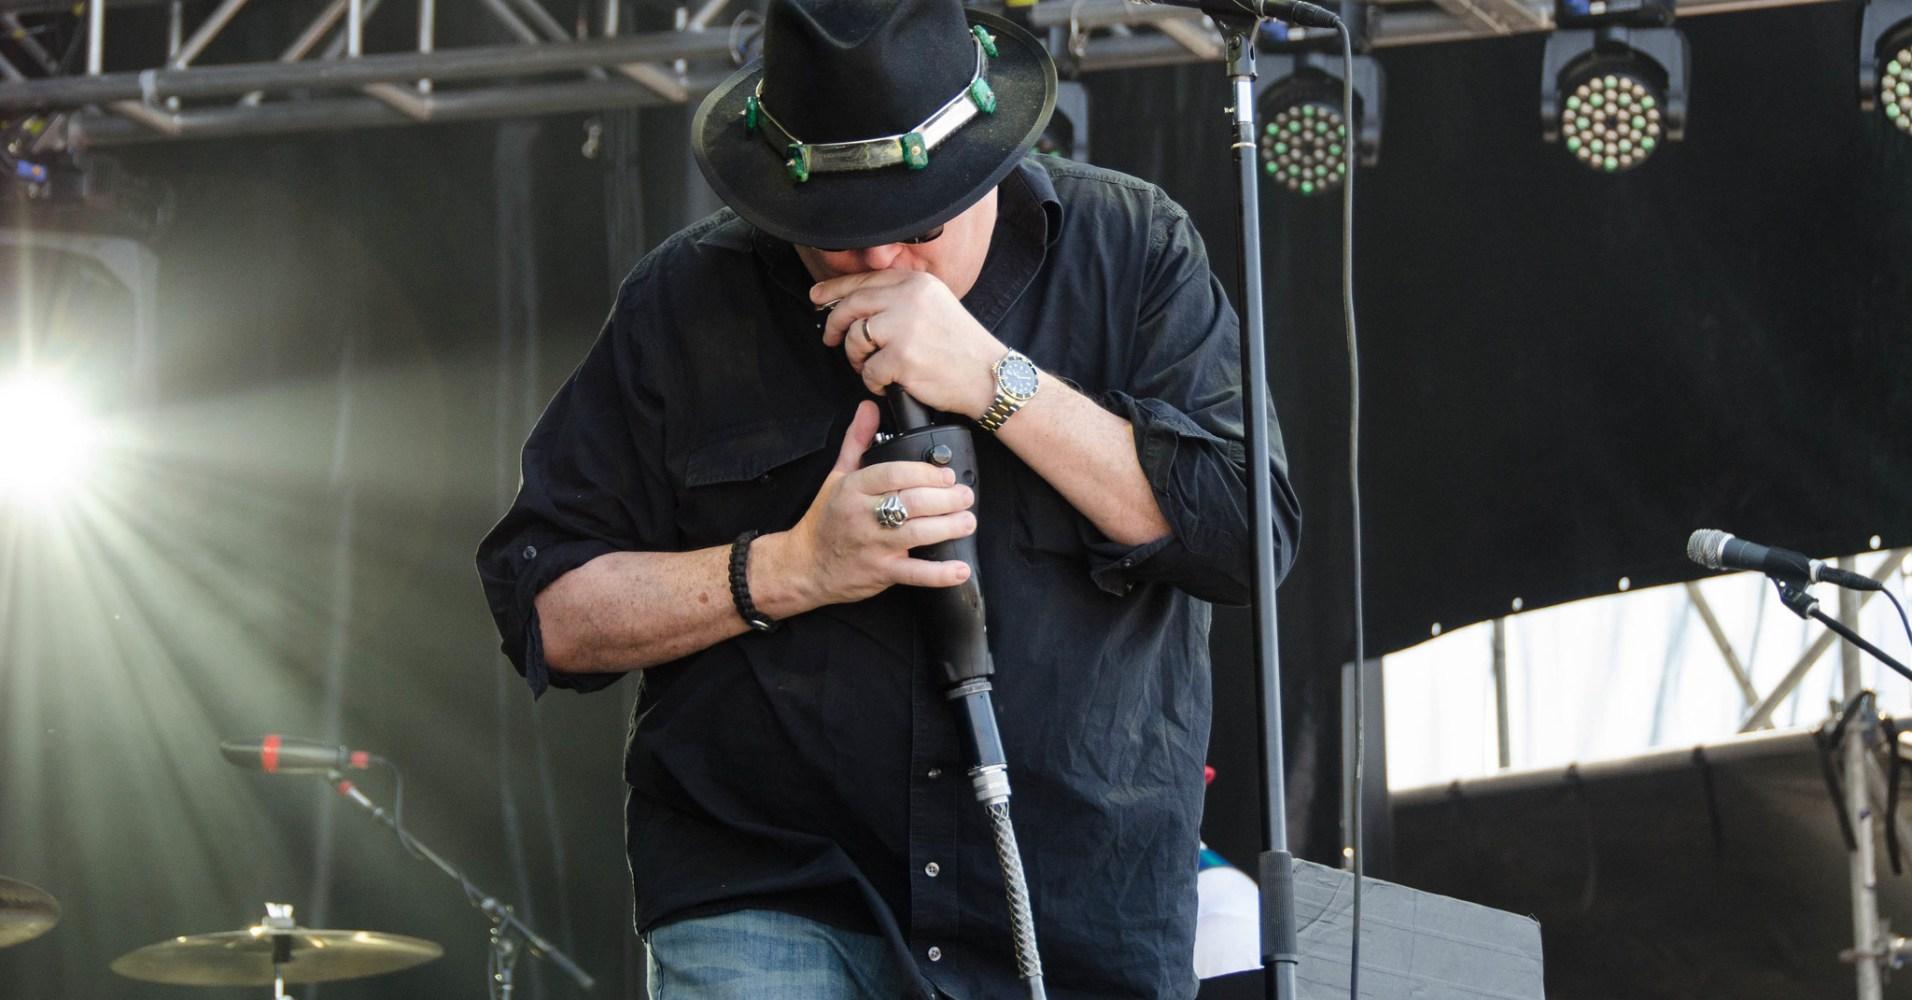 Blues Traveler - Indianapolis Motor Speedway Carb Day 5/25/18